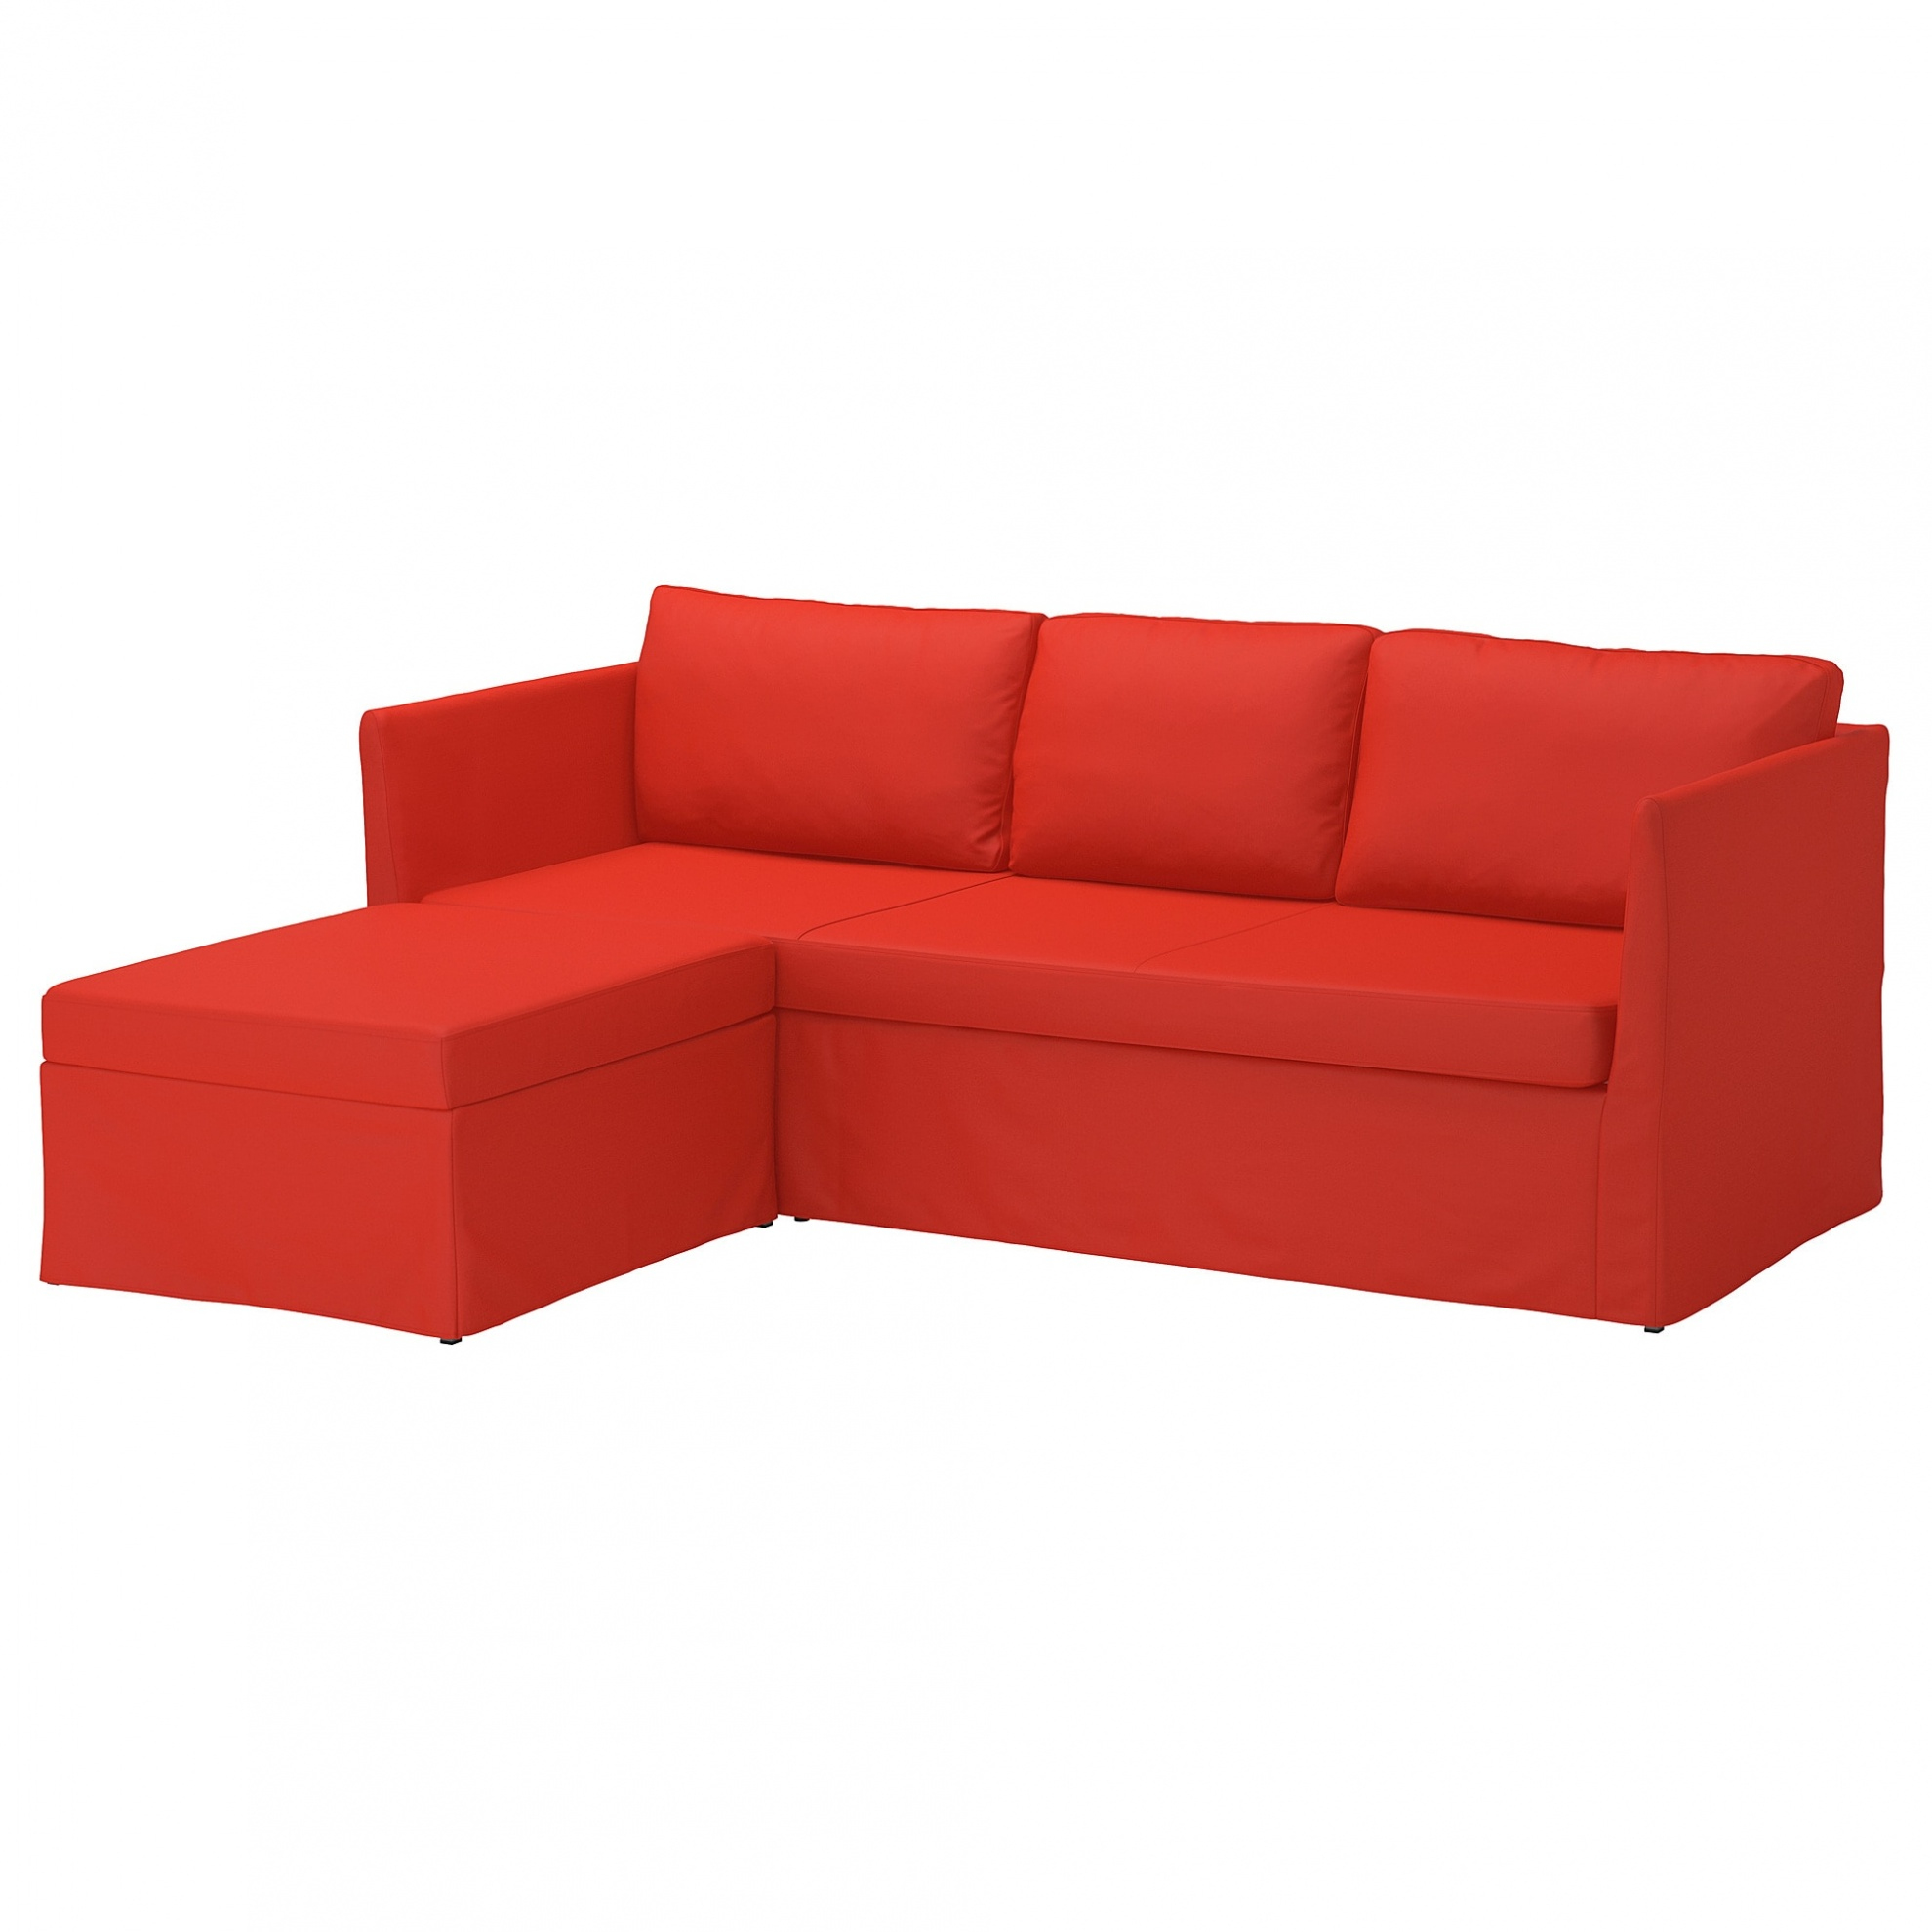 Canapé Convertible Angle Ikea Frais Photographie Maha S Canapé Tissu 3 Places Home Mahagranda